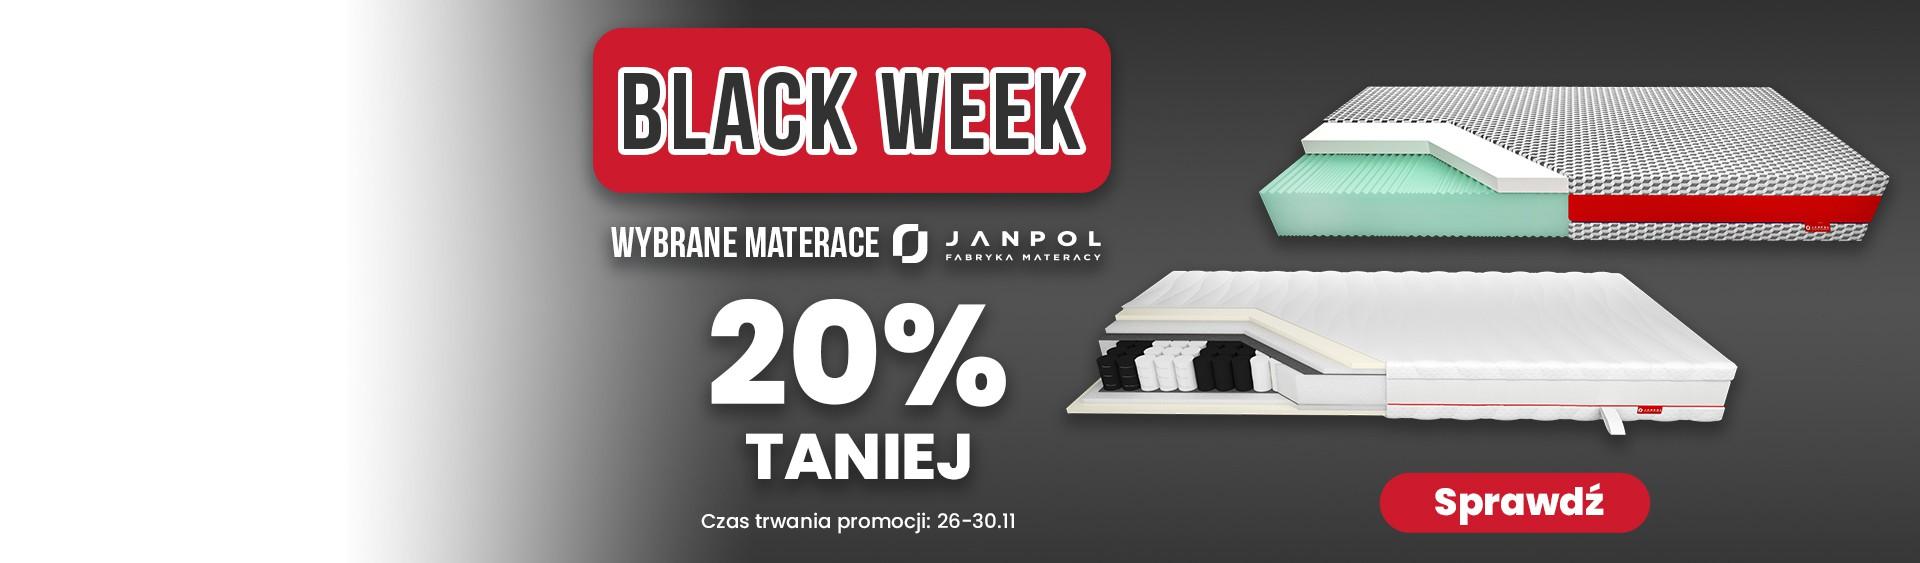 Materace Janpol - promocja Black Week